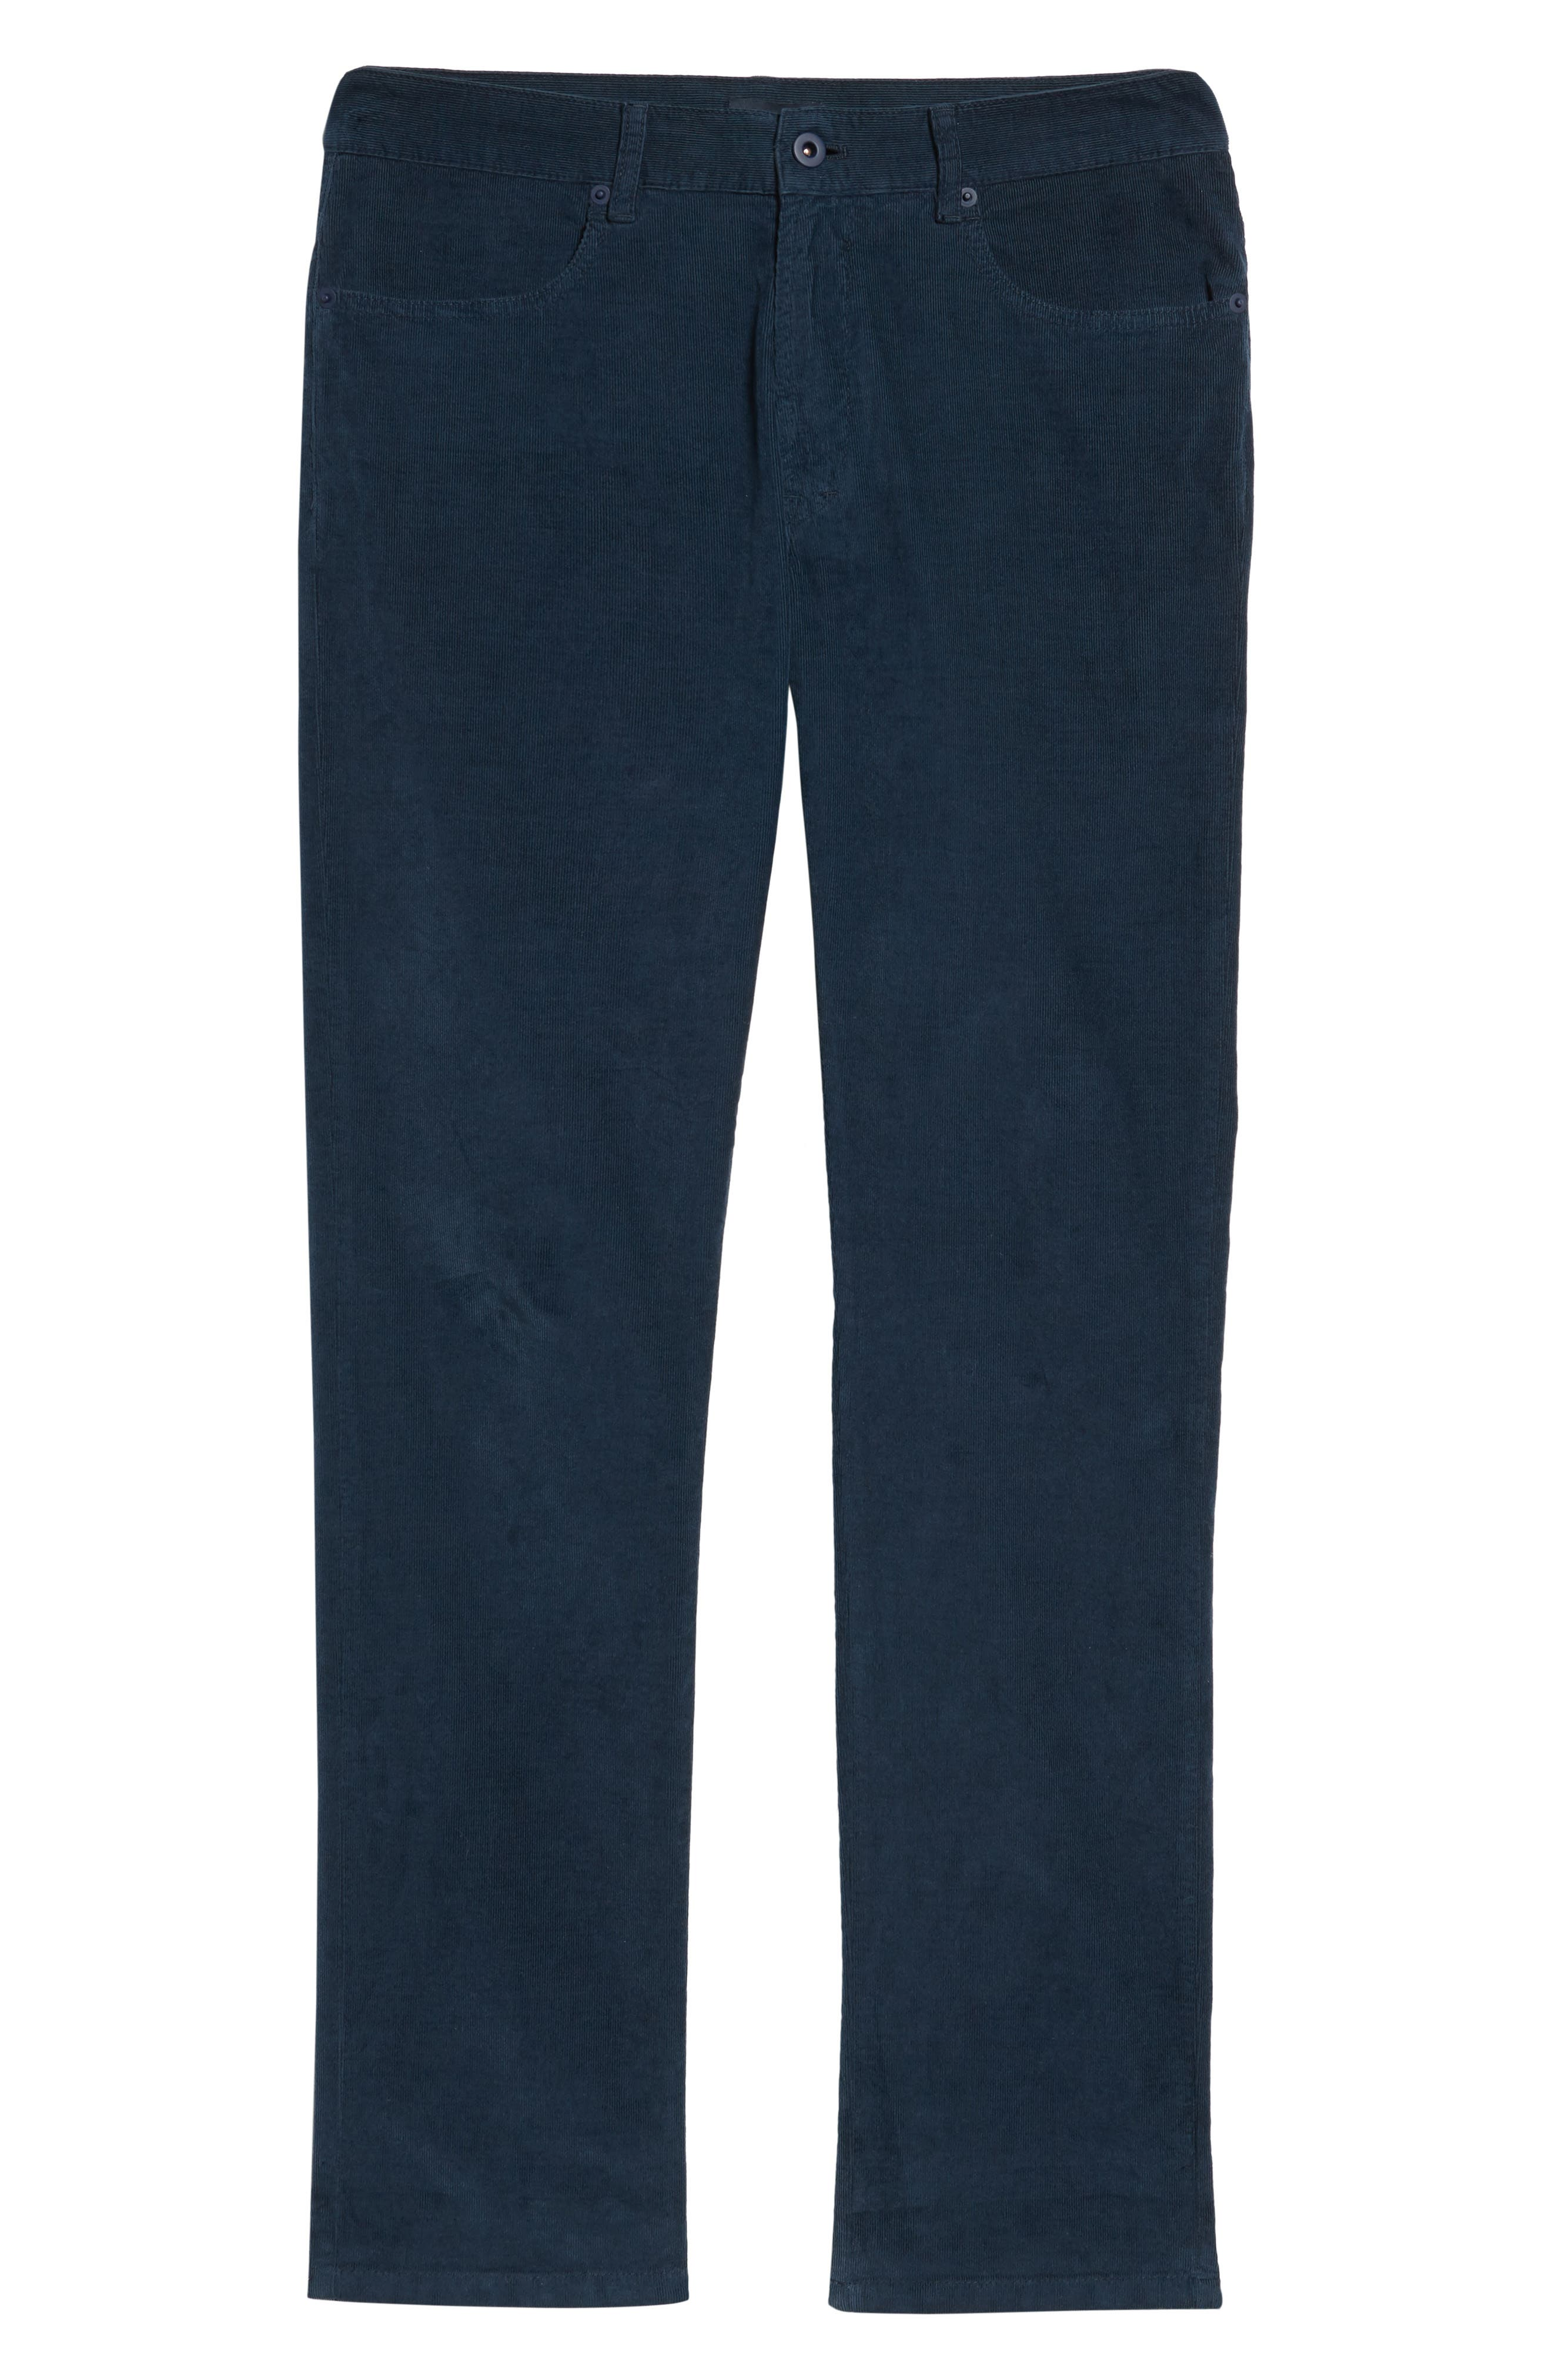 Redonda Stretch Corduroy Trousers,                             Alternate thumbnail 6, color,                             Midnight